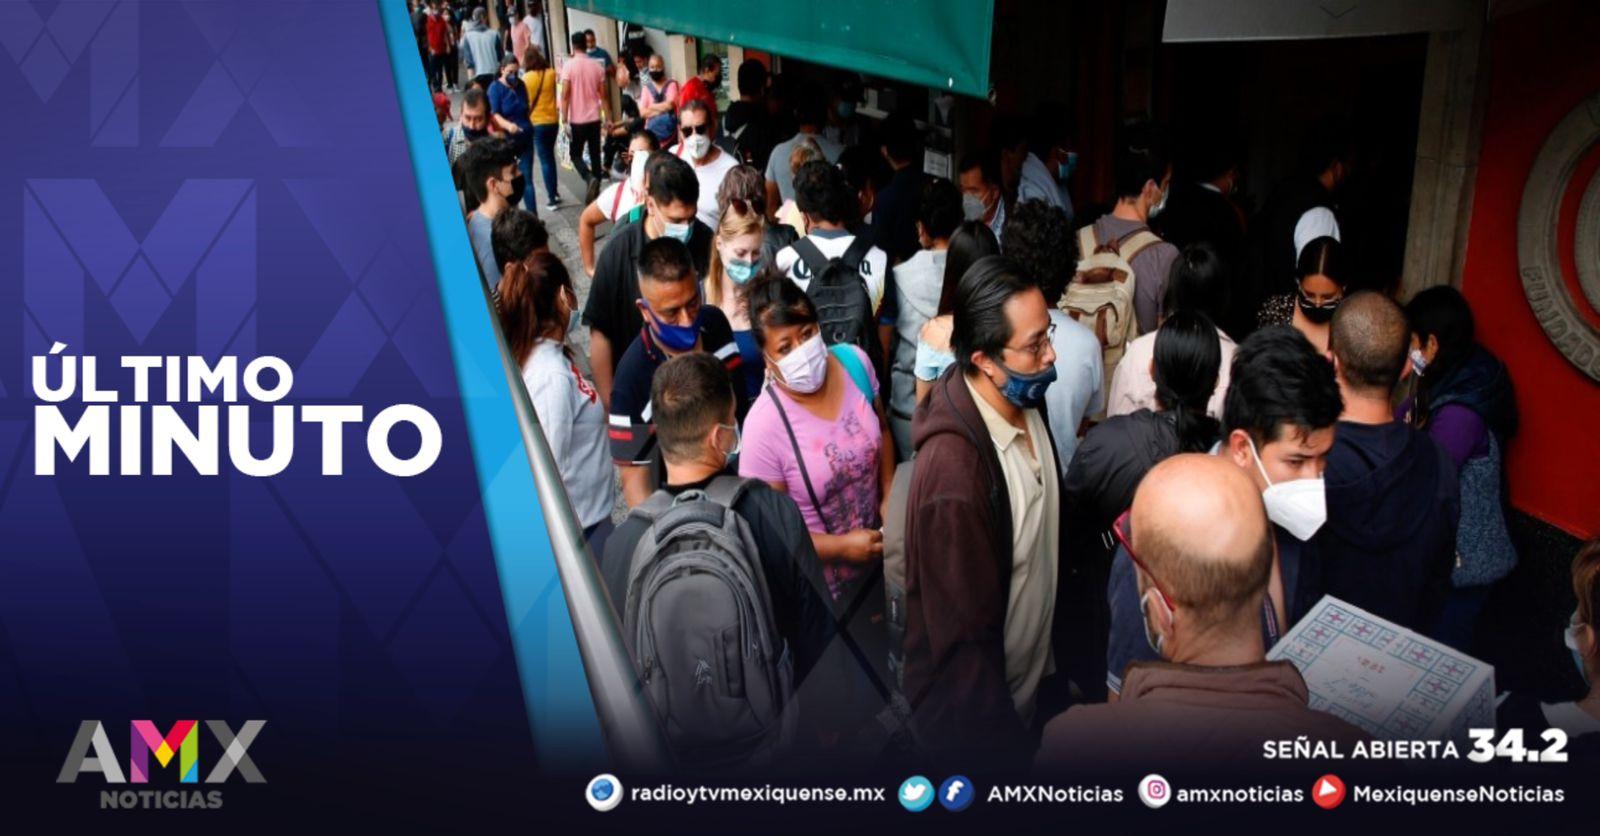 MÉXICO SUMA 503 MIL 918 CASOS SOSPECHOSOS DE COVID-19